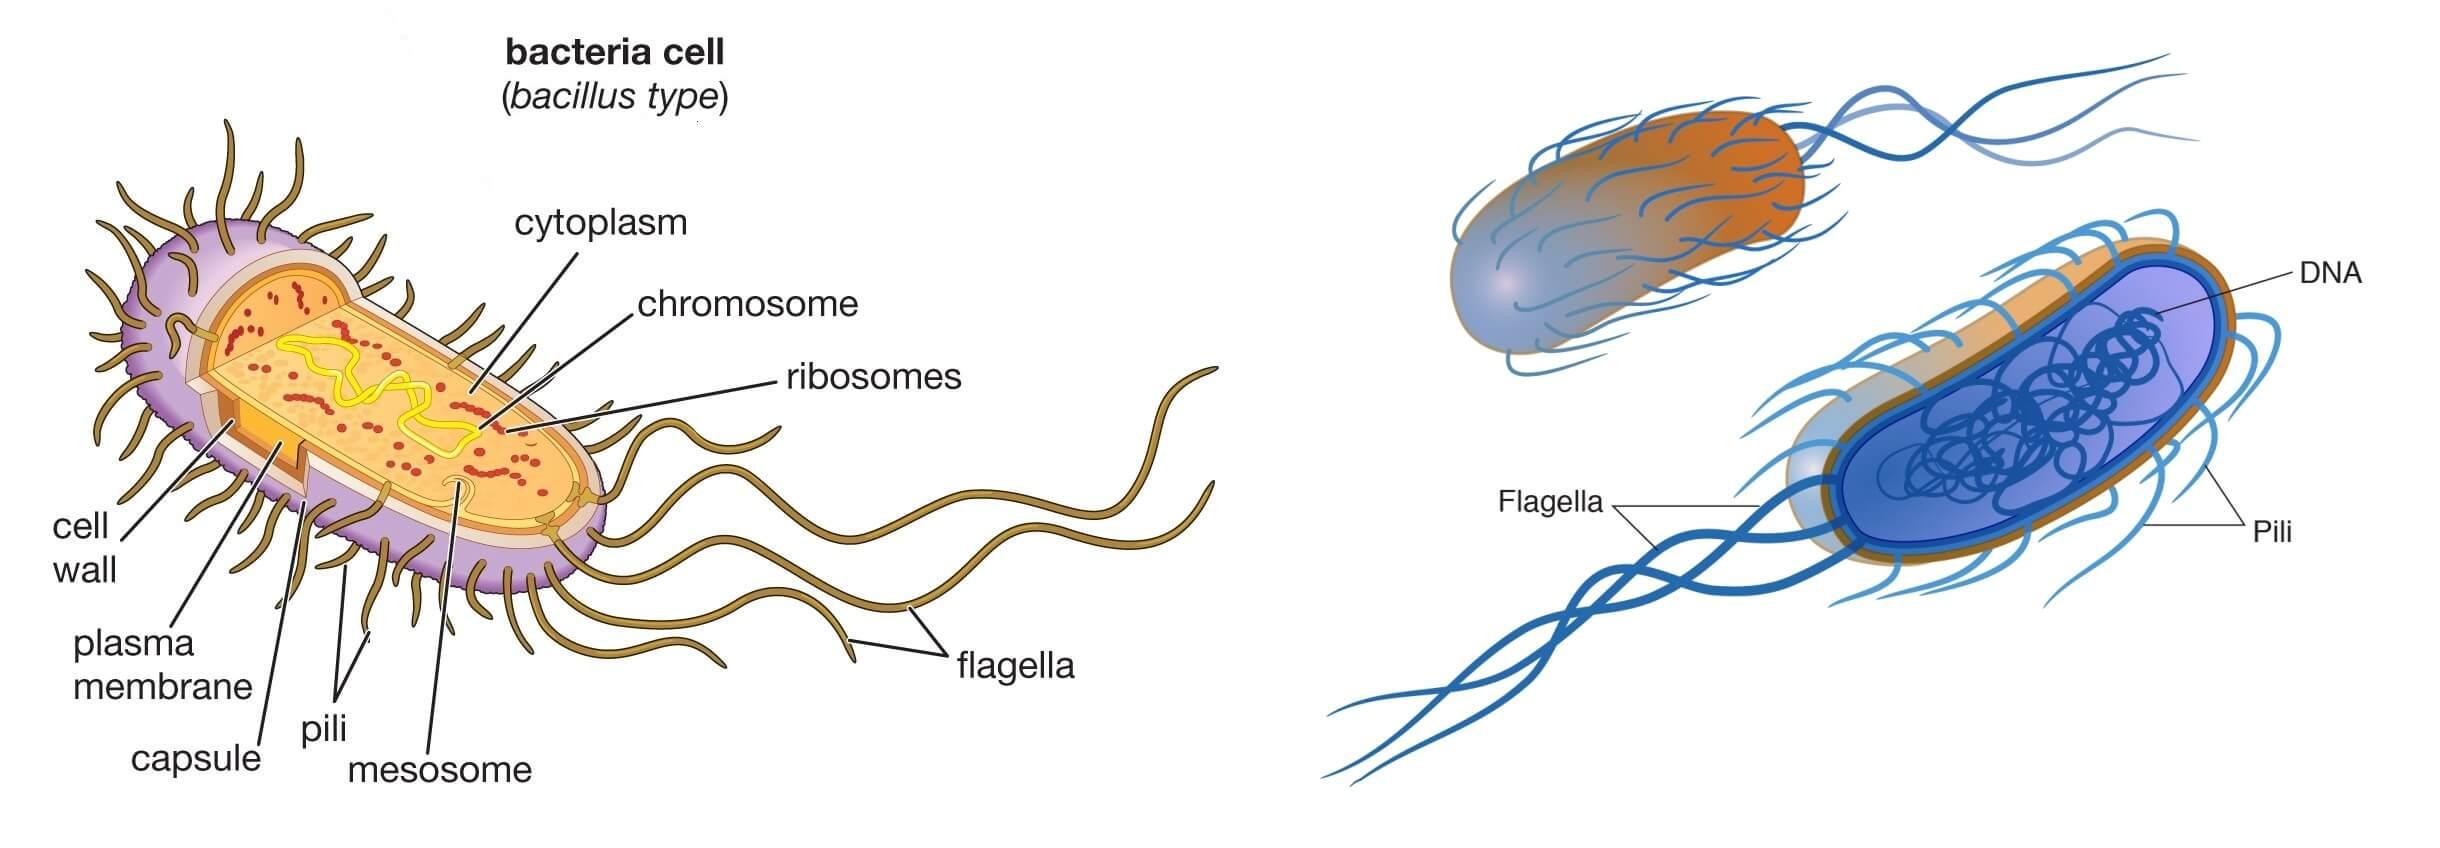 bacillus bacteria cell